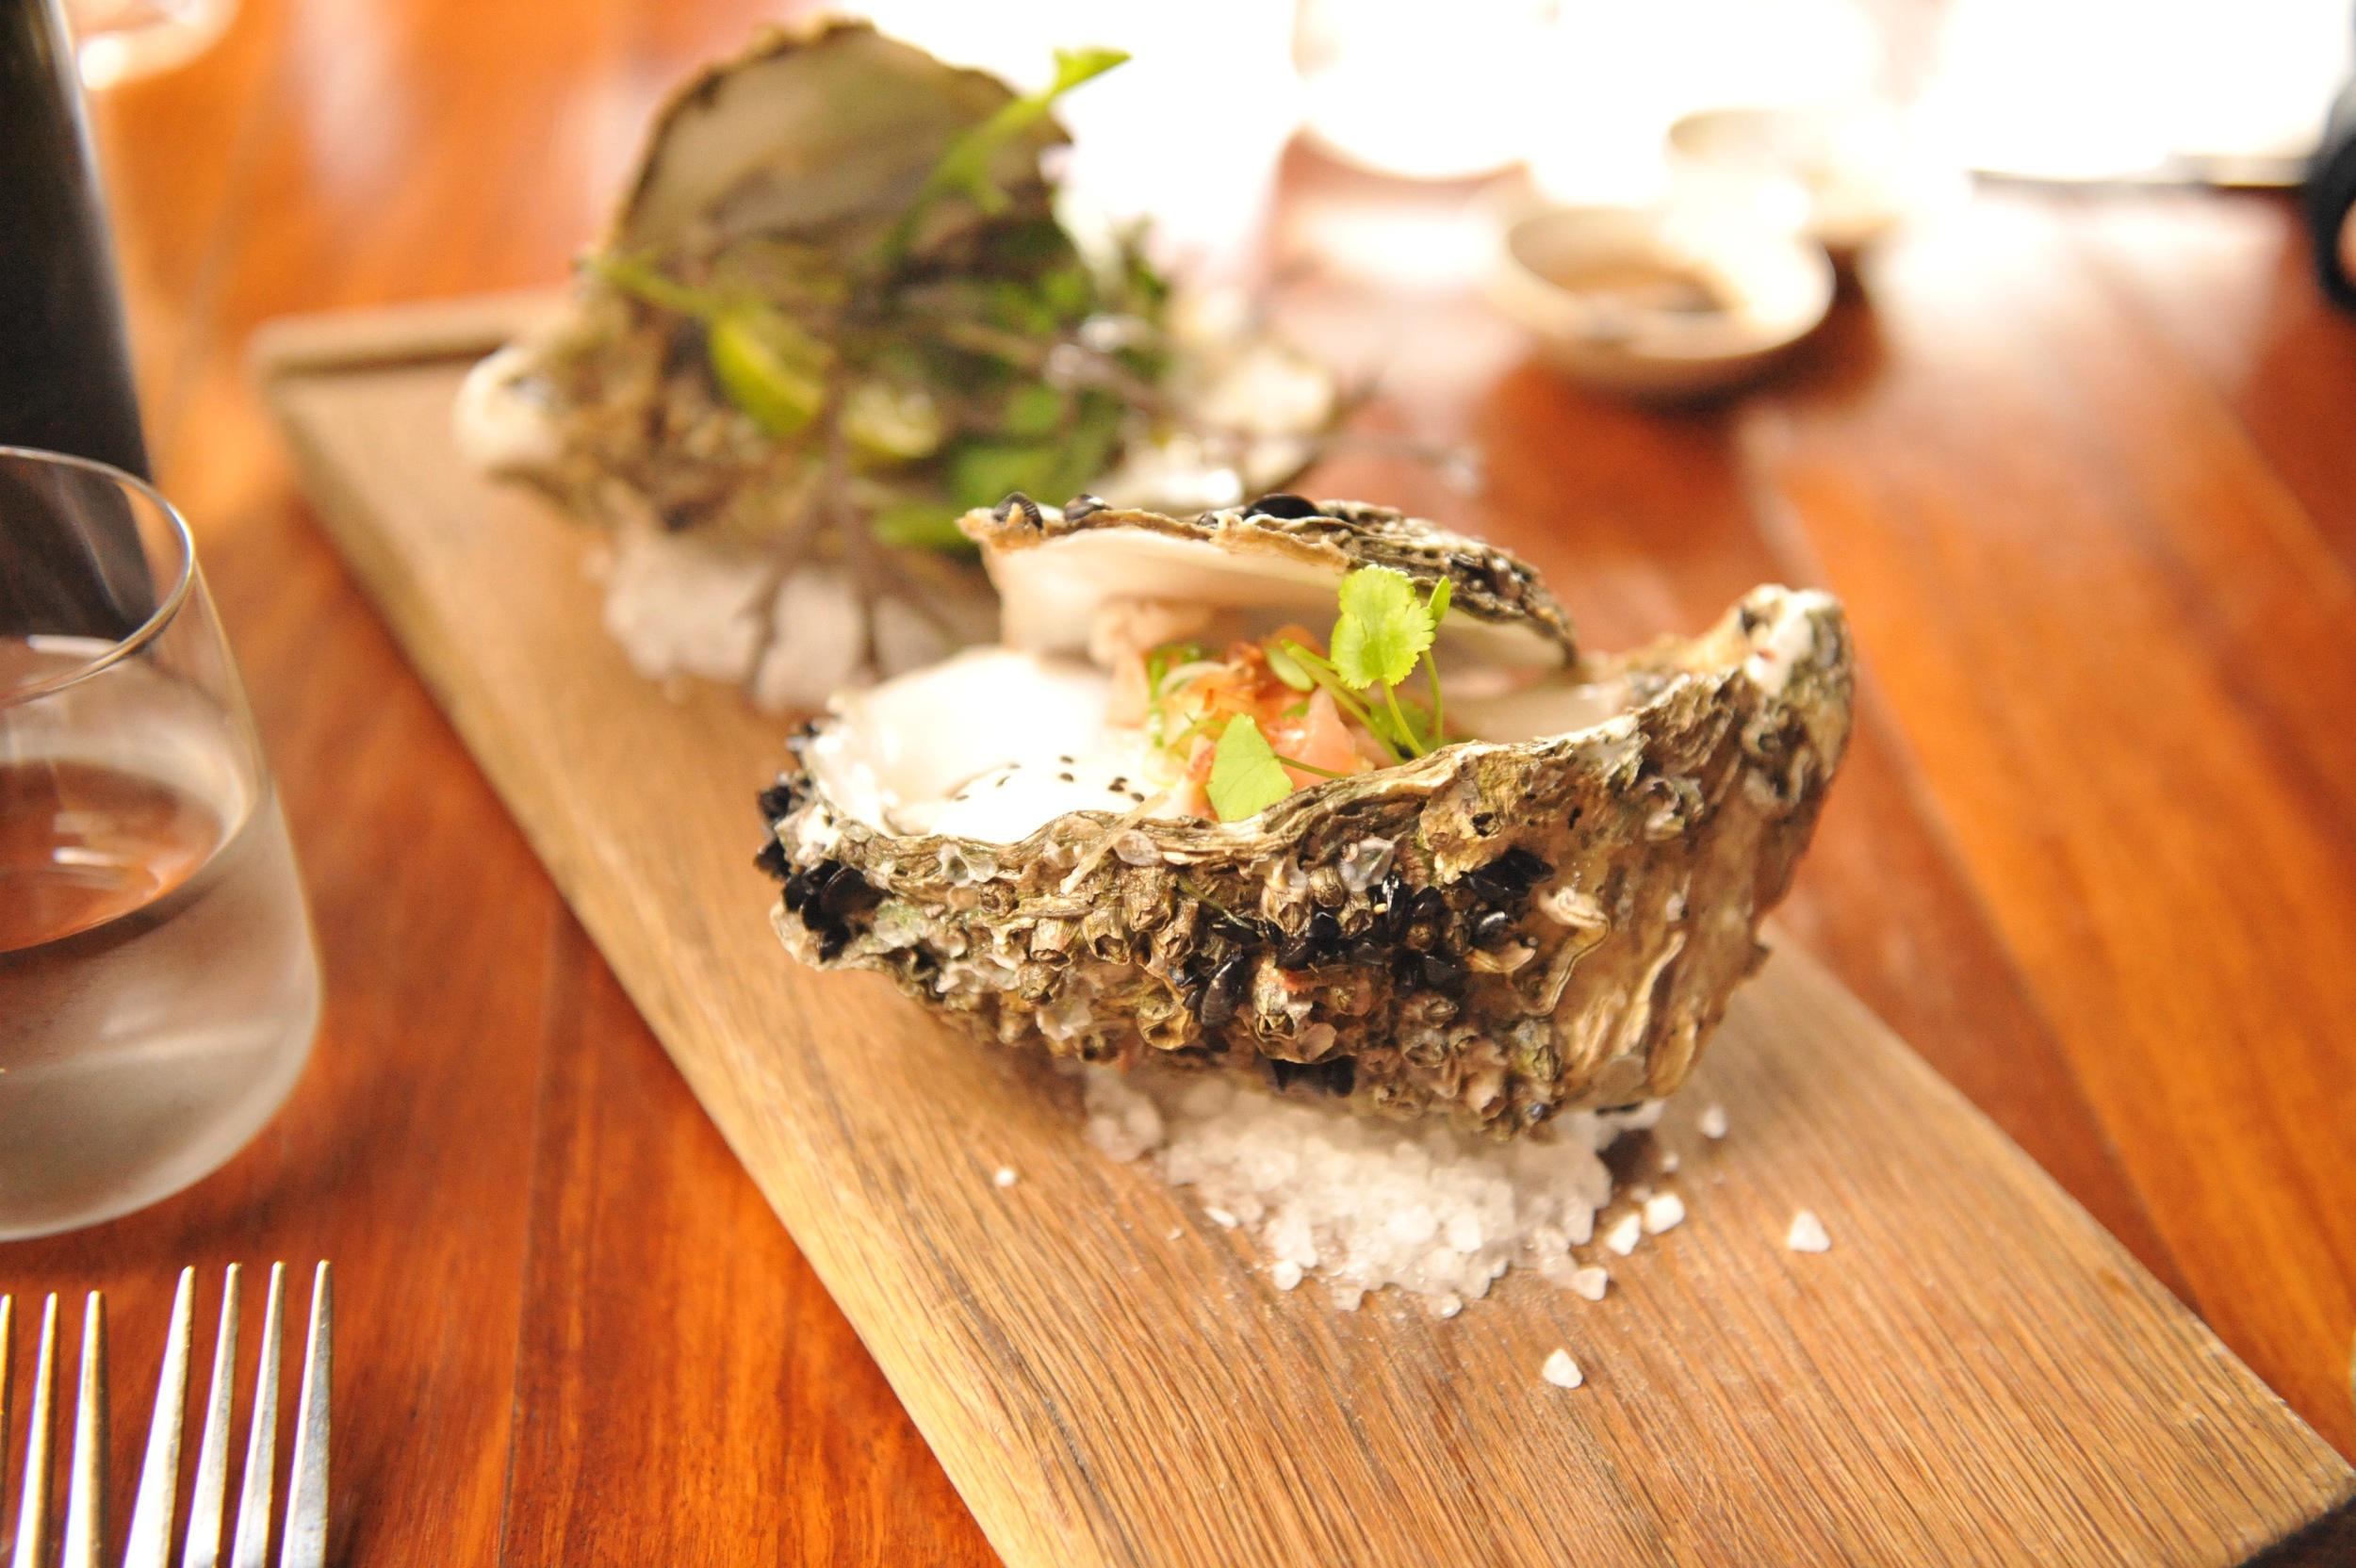 Giant oysters at d'Arry's Verandah